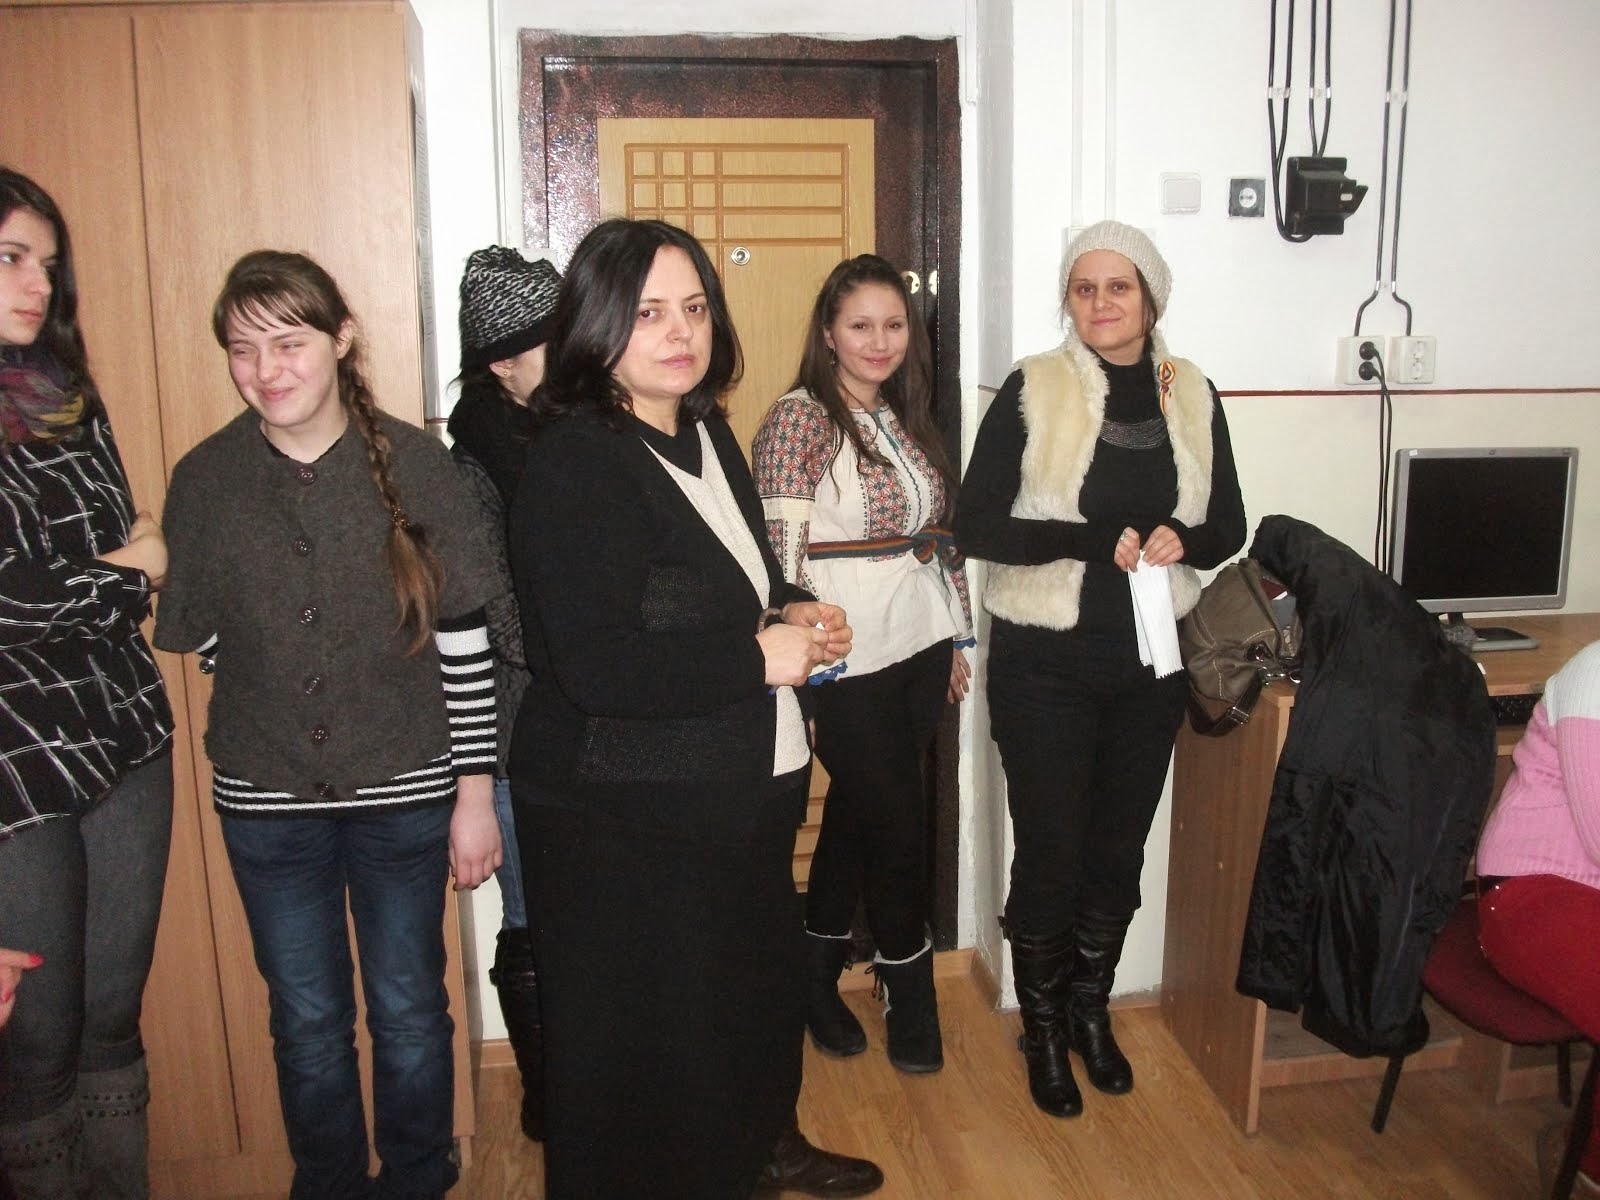 Aniversarea Unirii Principatelor la Liceul Teoretic Roznov, 24.01.2014...